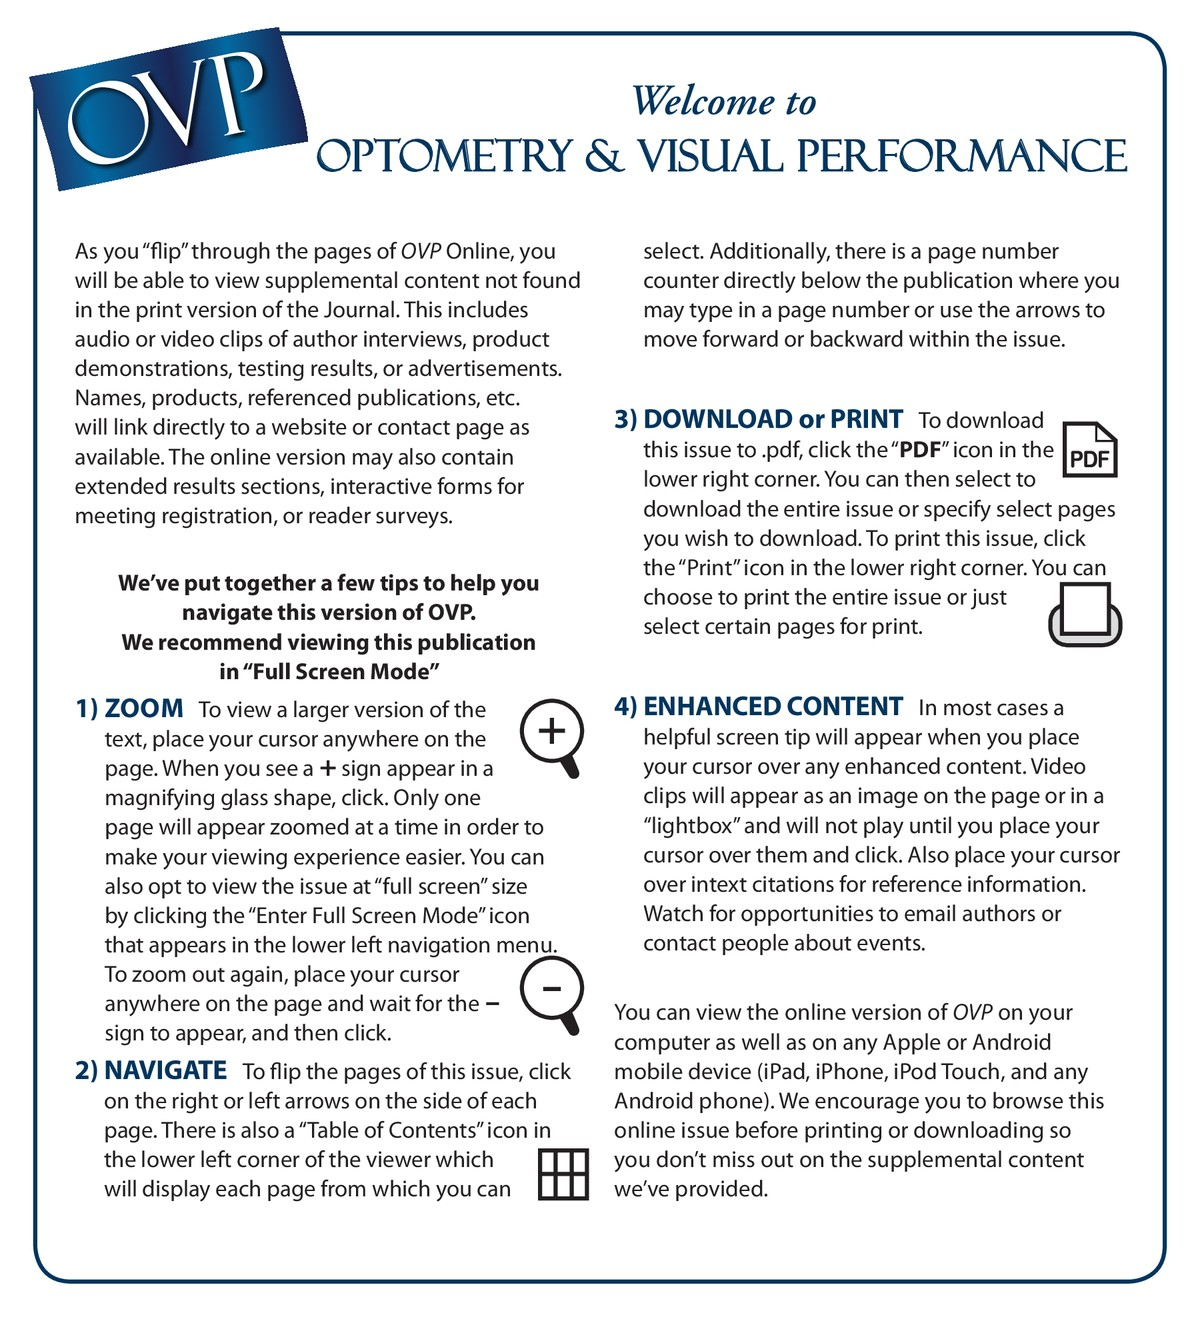 Optometry & Visual Performance